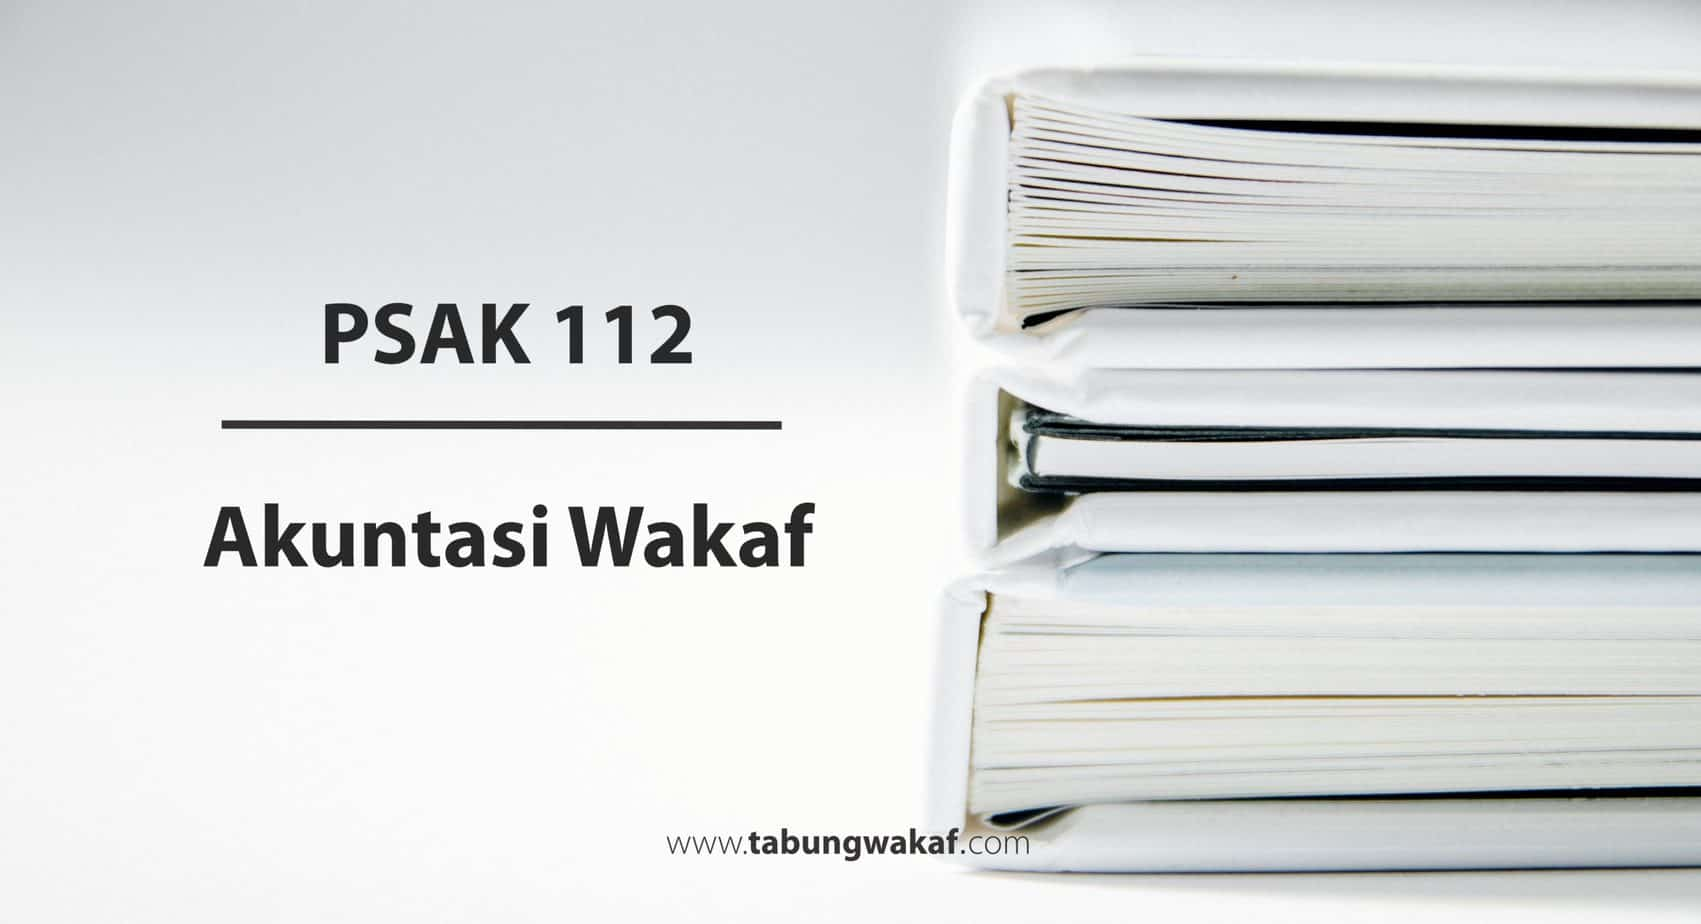 PSAK 112